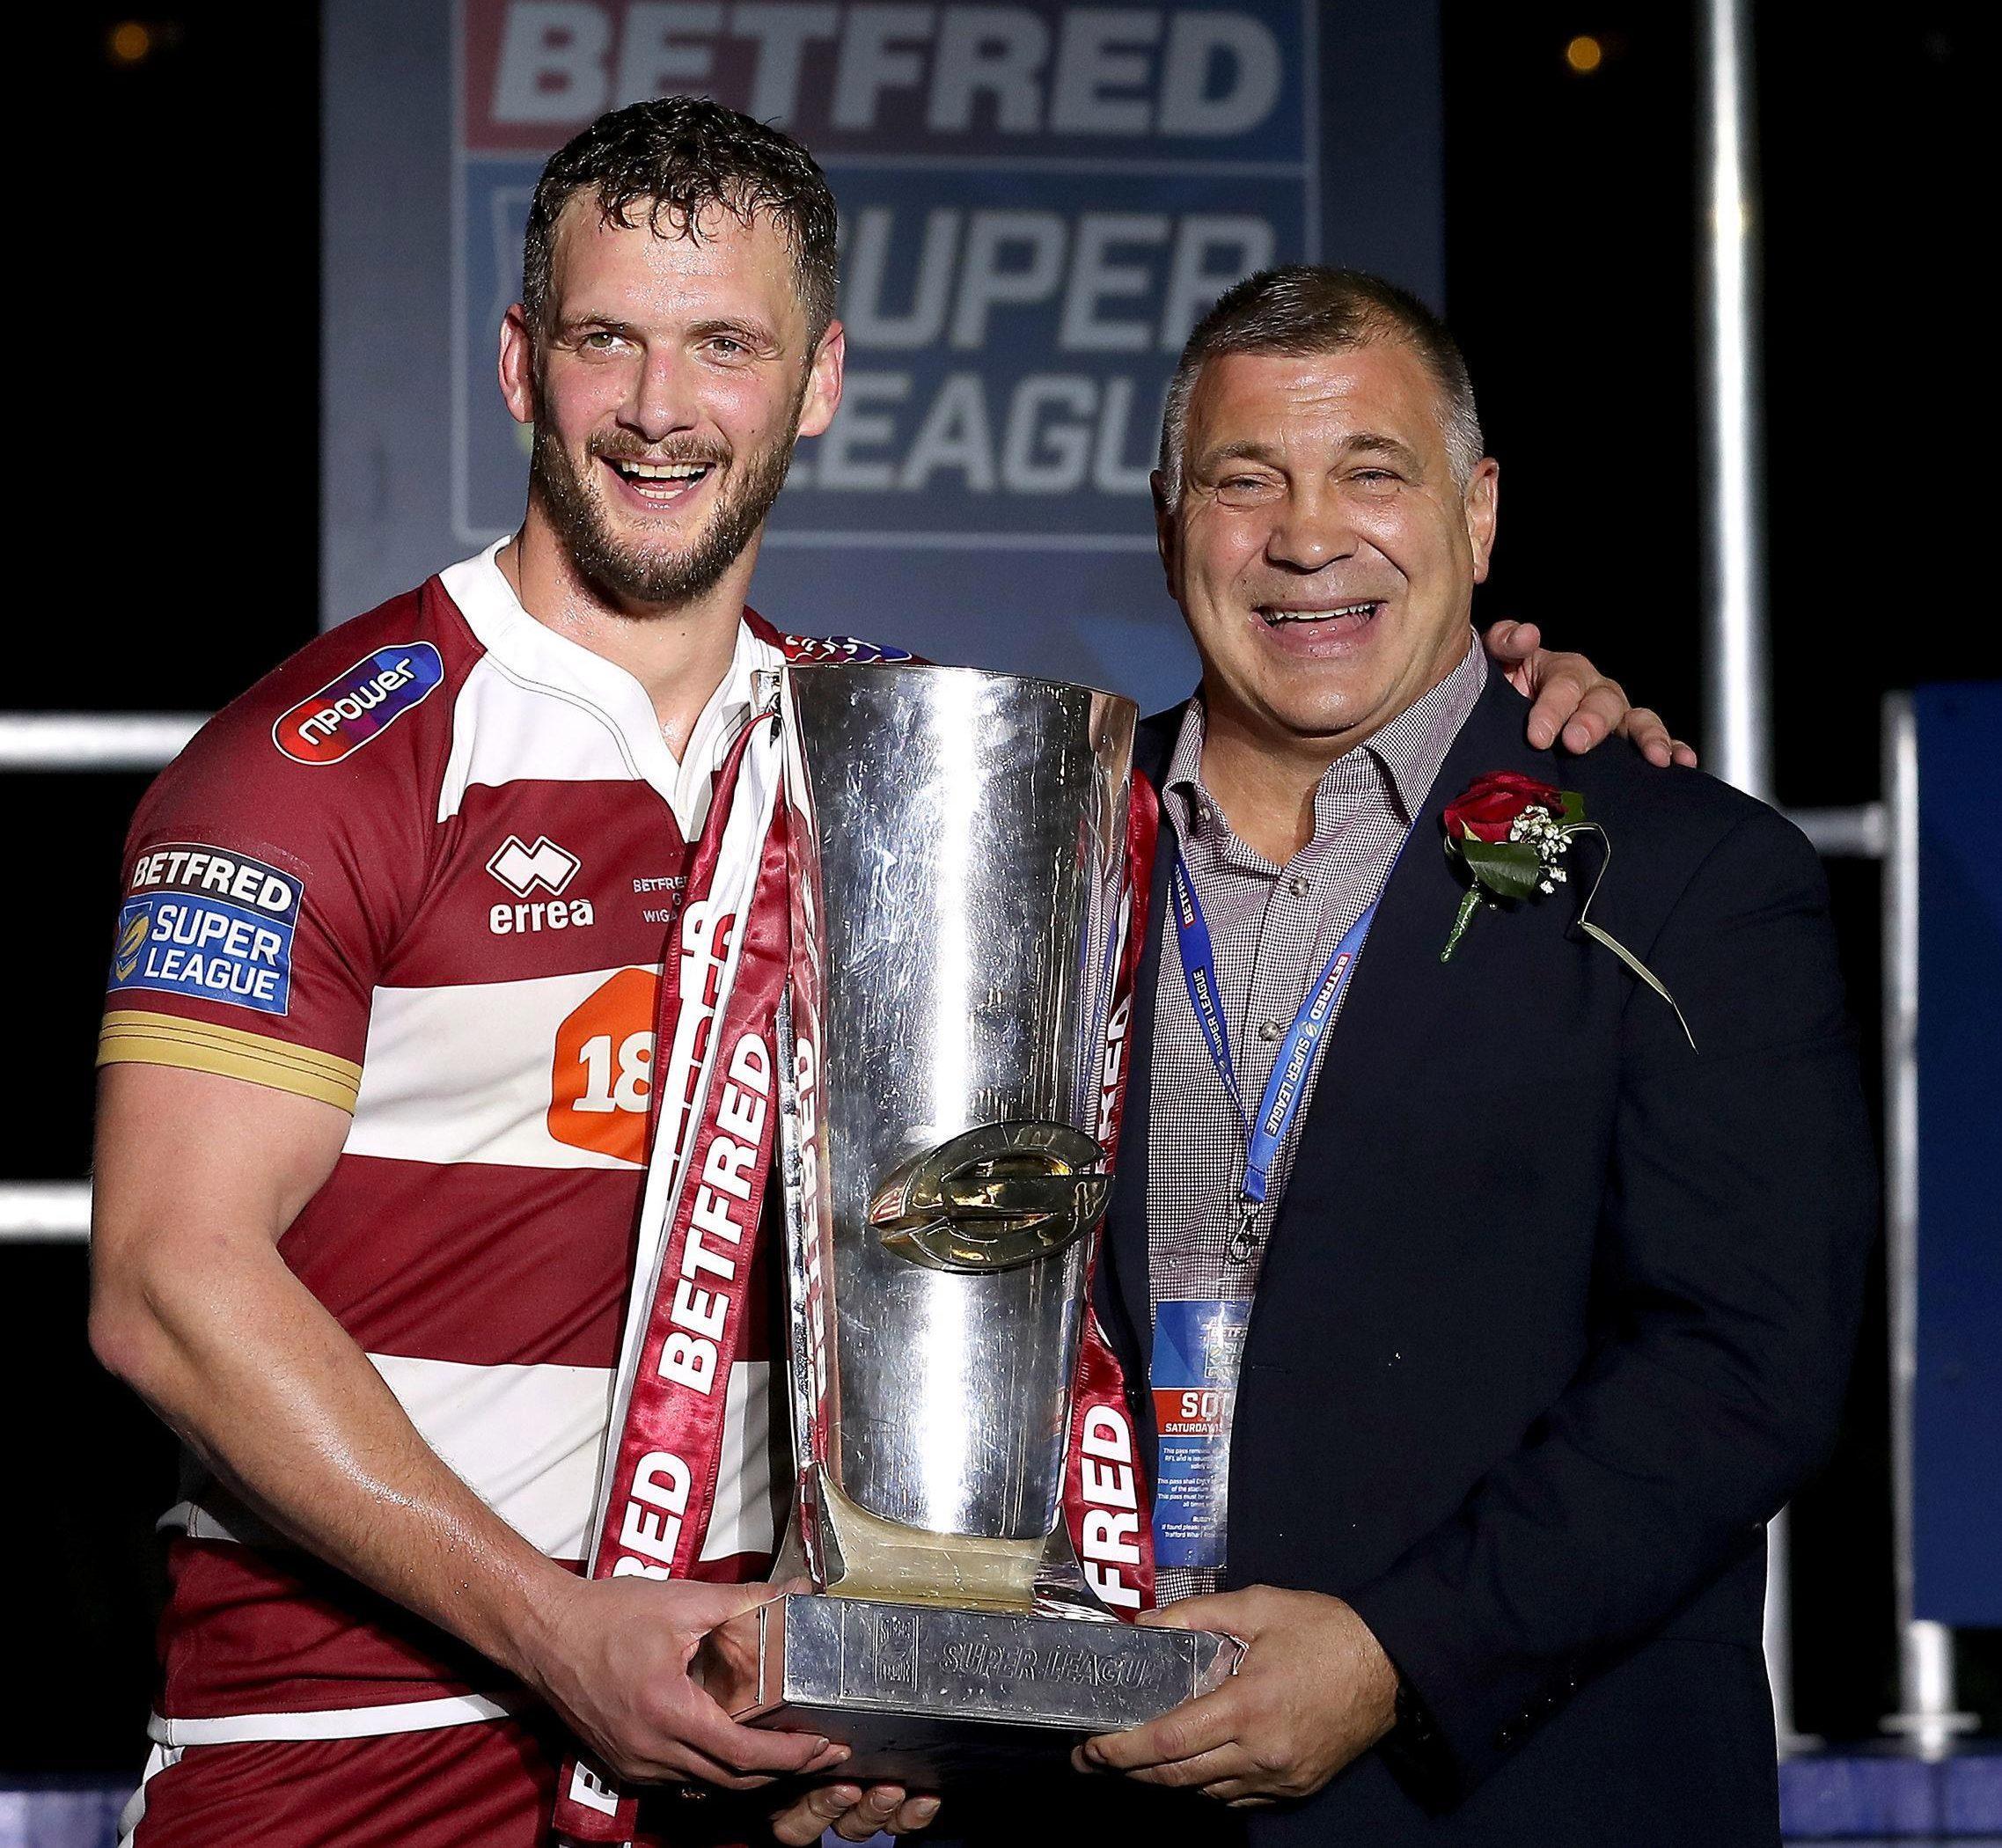 Wigan skipper Sean O'Loughlin, left, lifted the Super League trophy this year